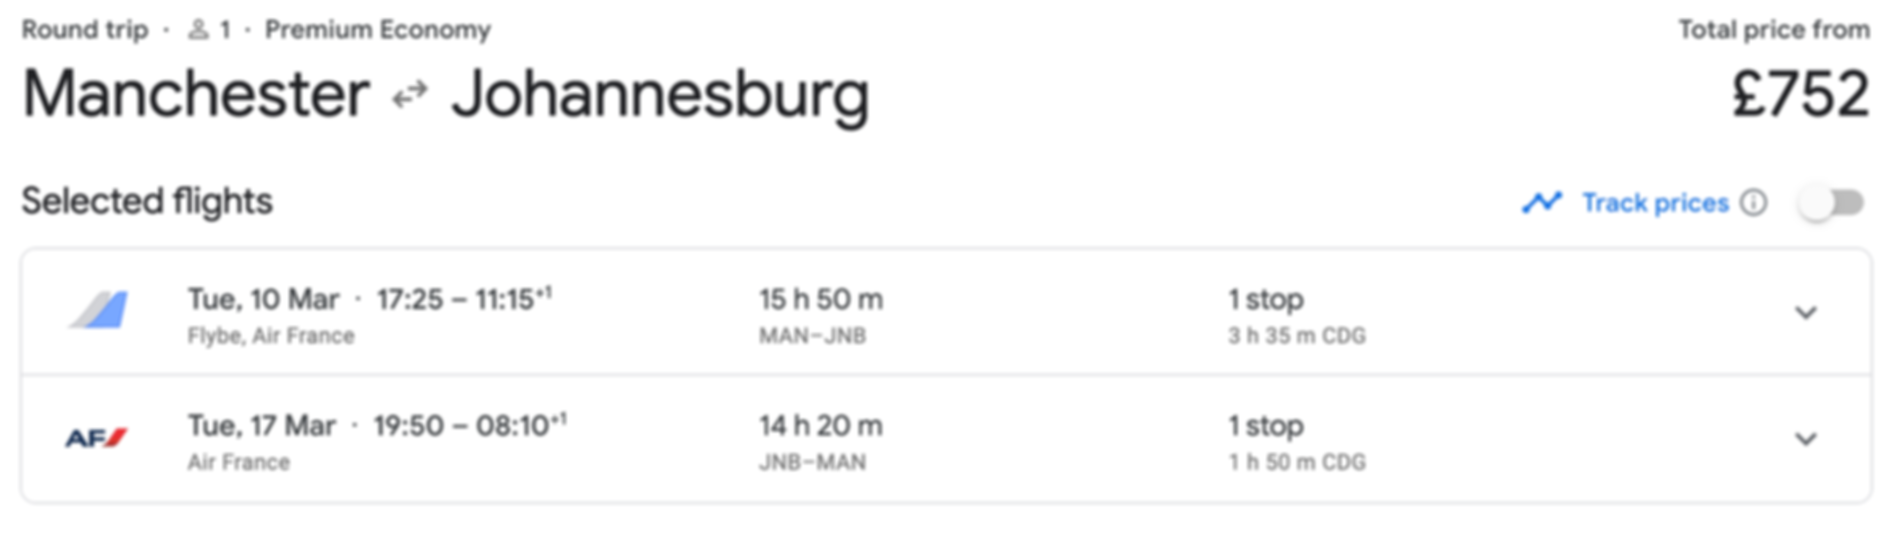 UK - Johannesburg [Premium Economy] from only £752 RTN